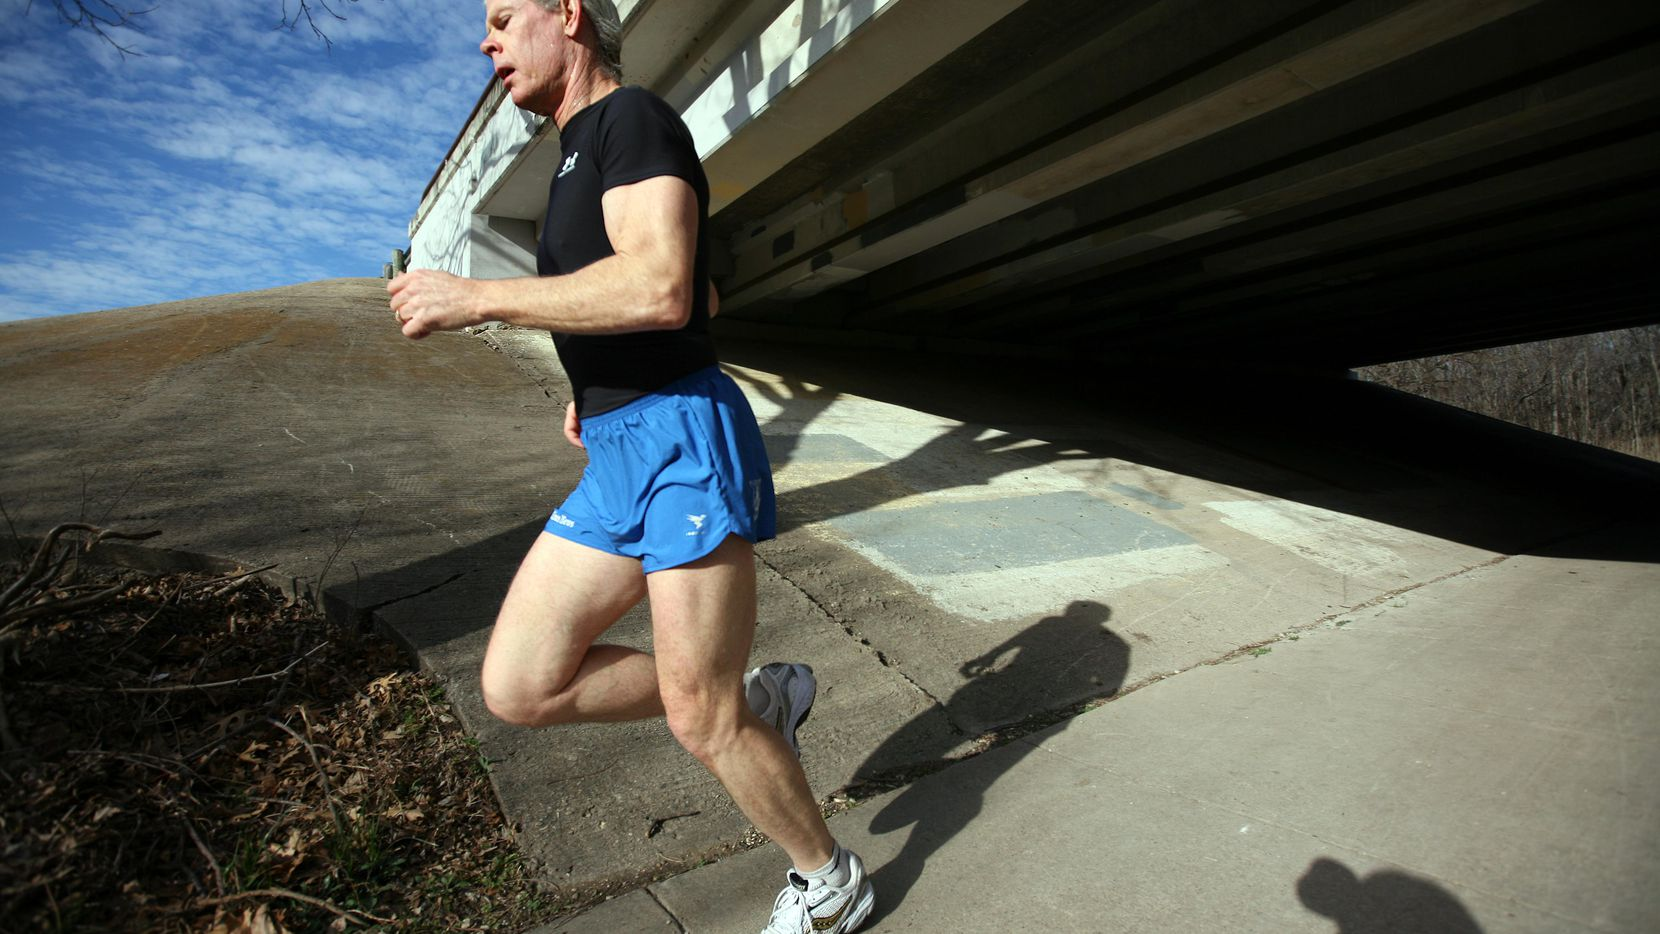 Chris Phelan, pictured here in 2009. (Sonya N. Hebert/The Dallas Morning News)